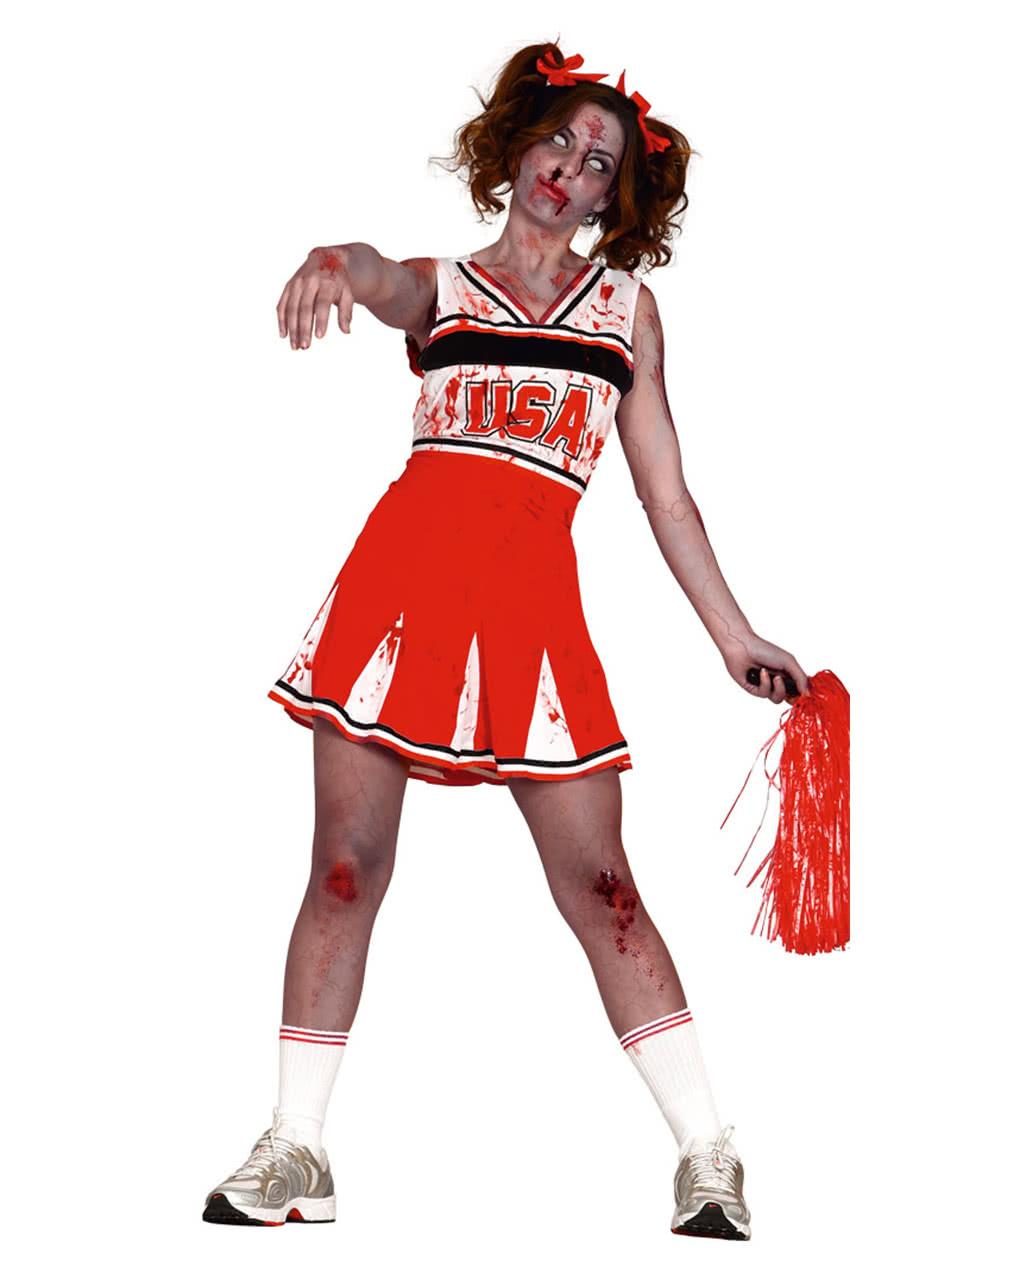 Cheerleader zombie costume for zombie walks halloween horror cheerleader zombie costume for zombie walks halloween horror shop solutioingenieria Gallery